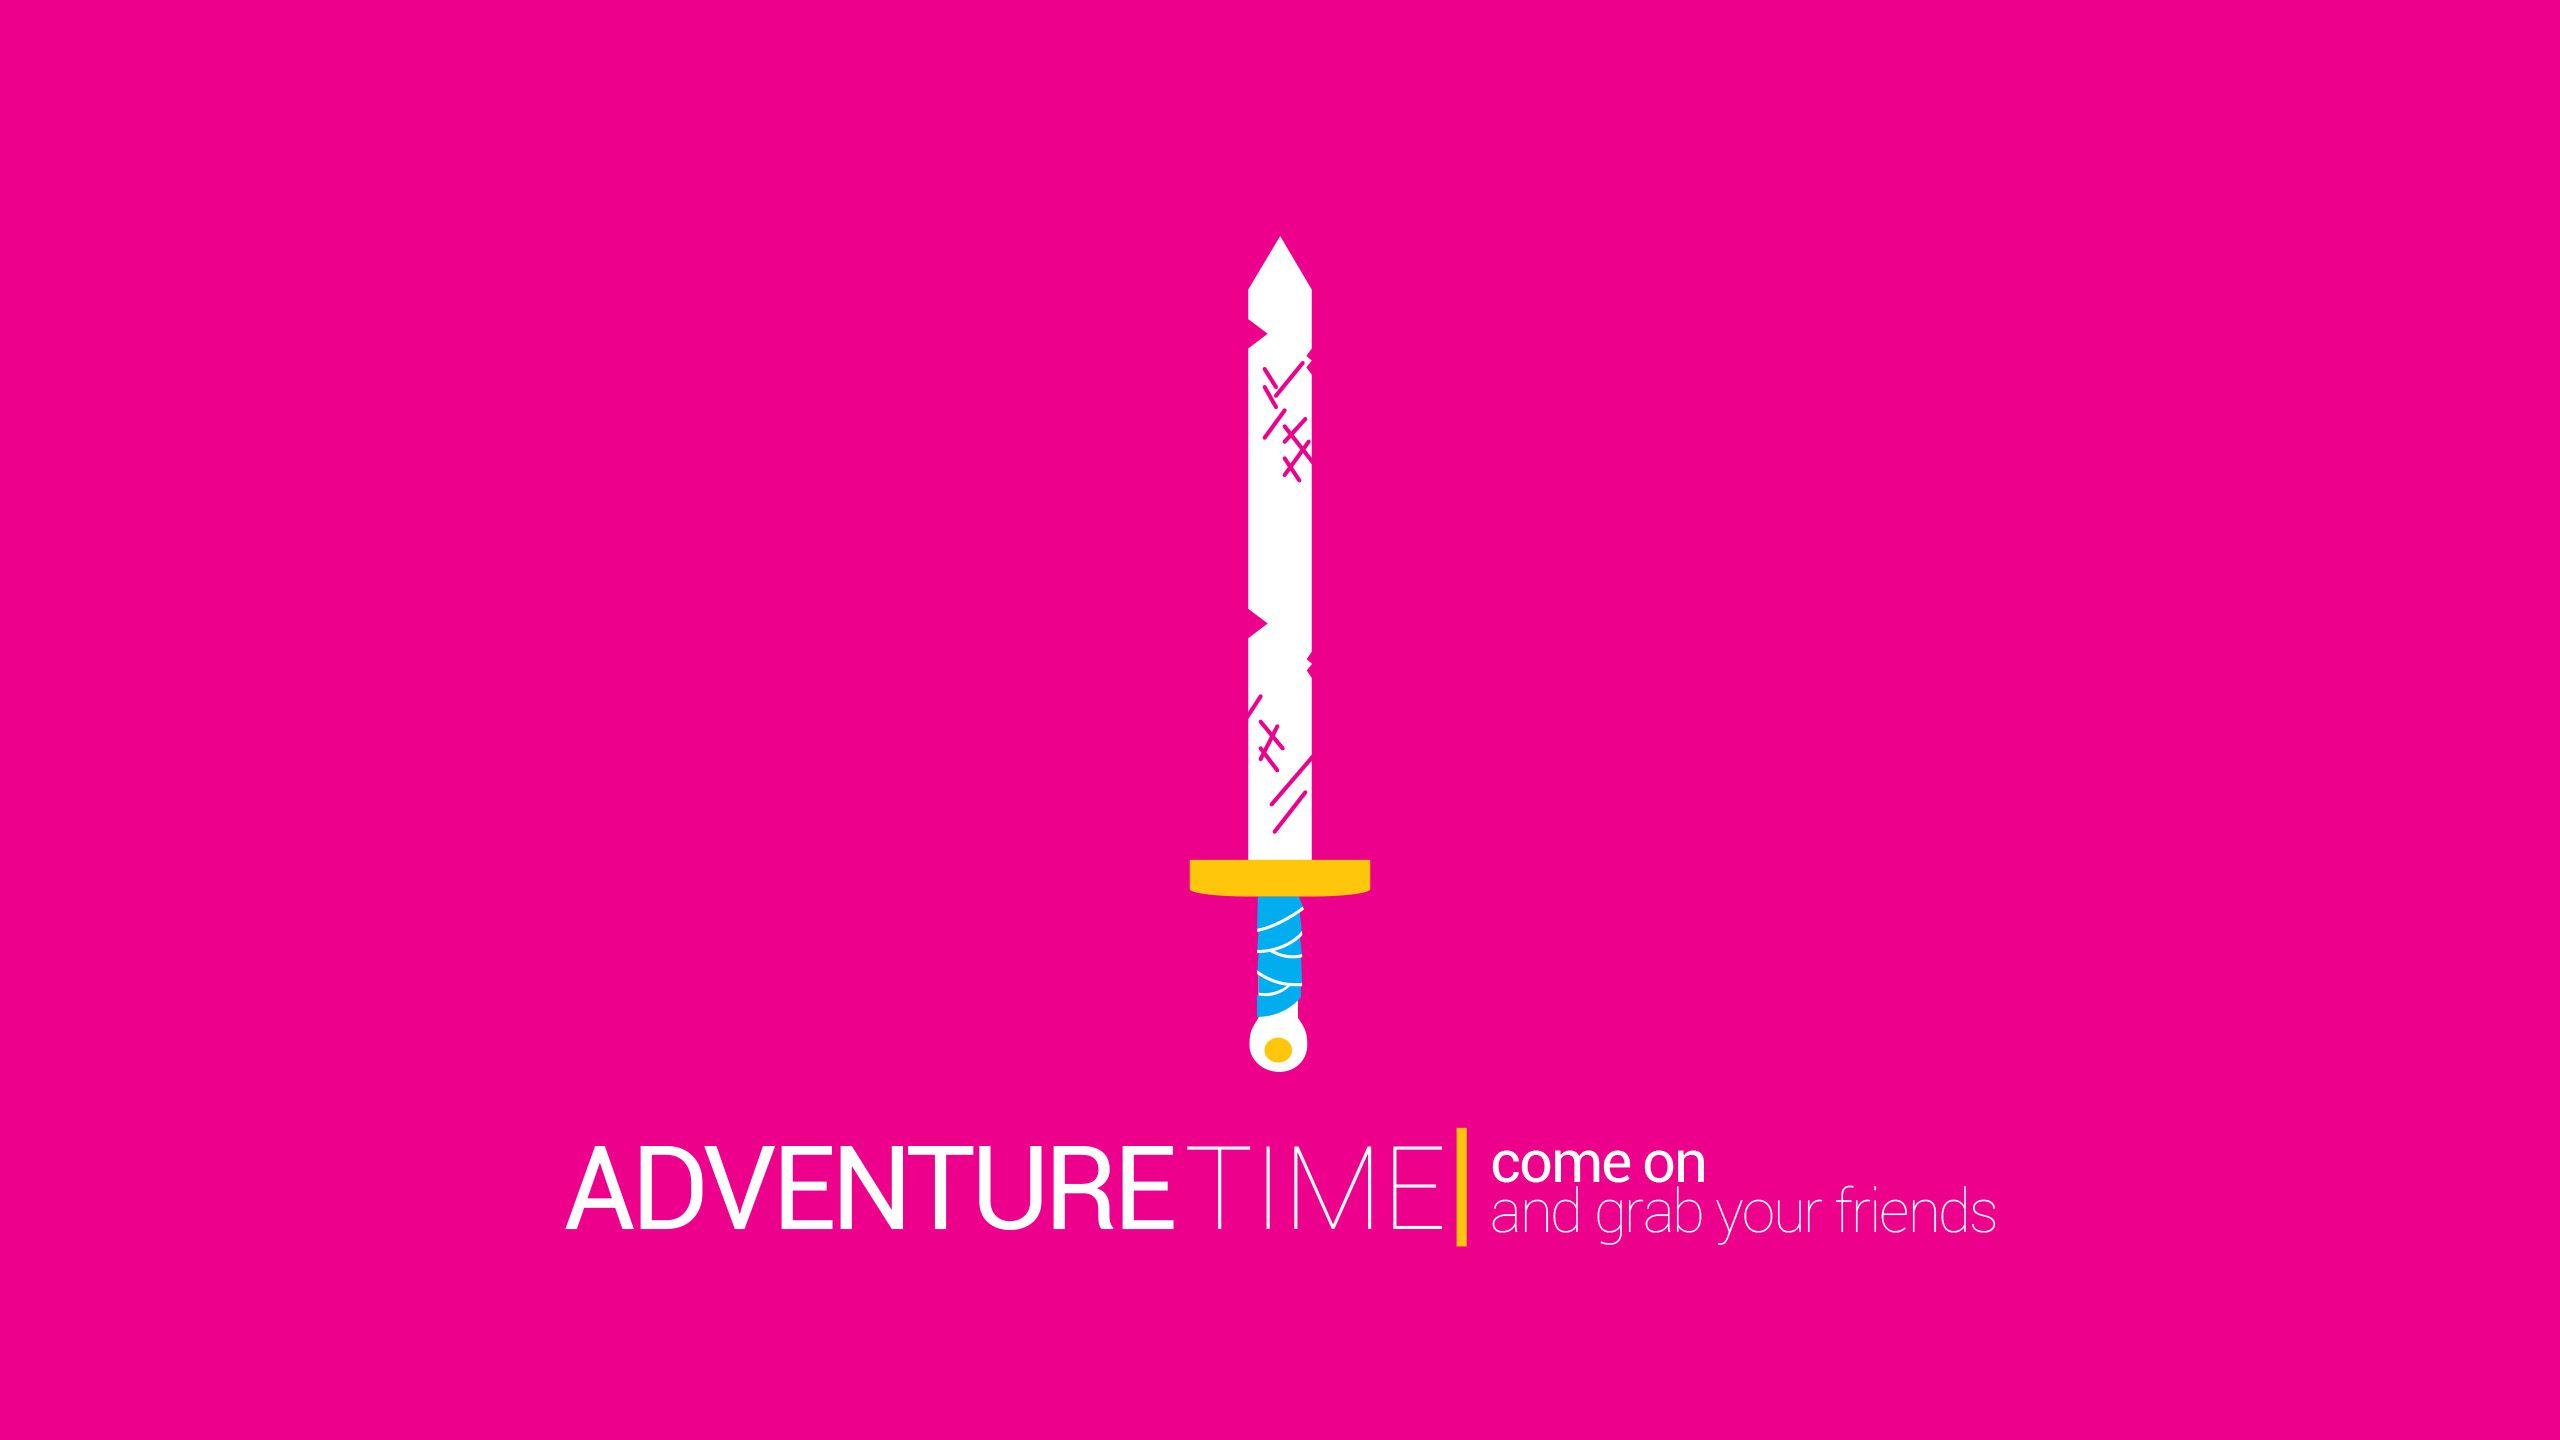 Adventure Time 2560x1440 [OC]